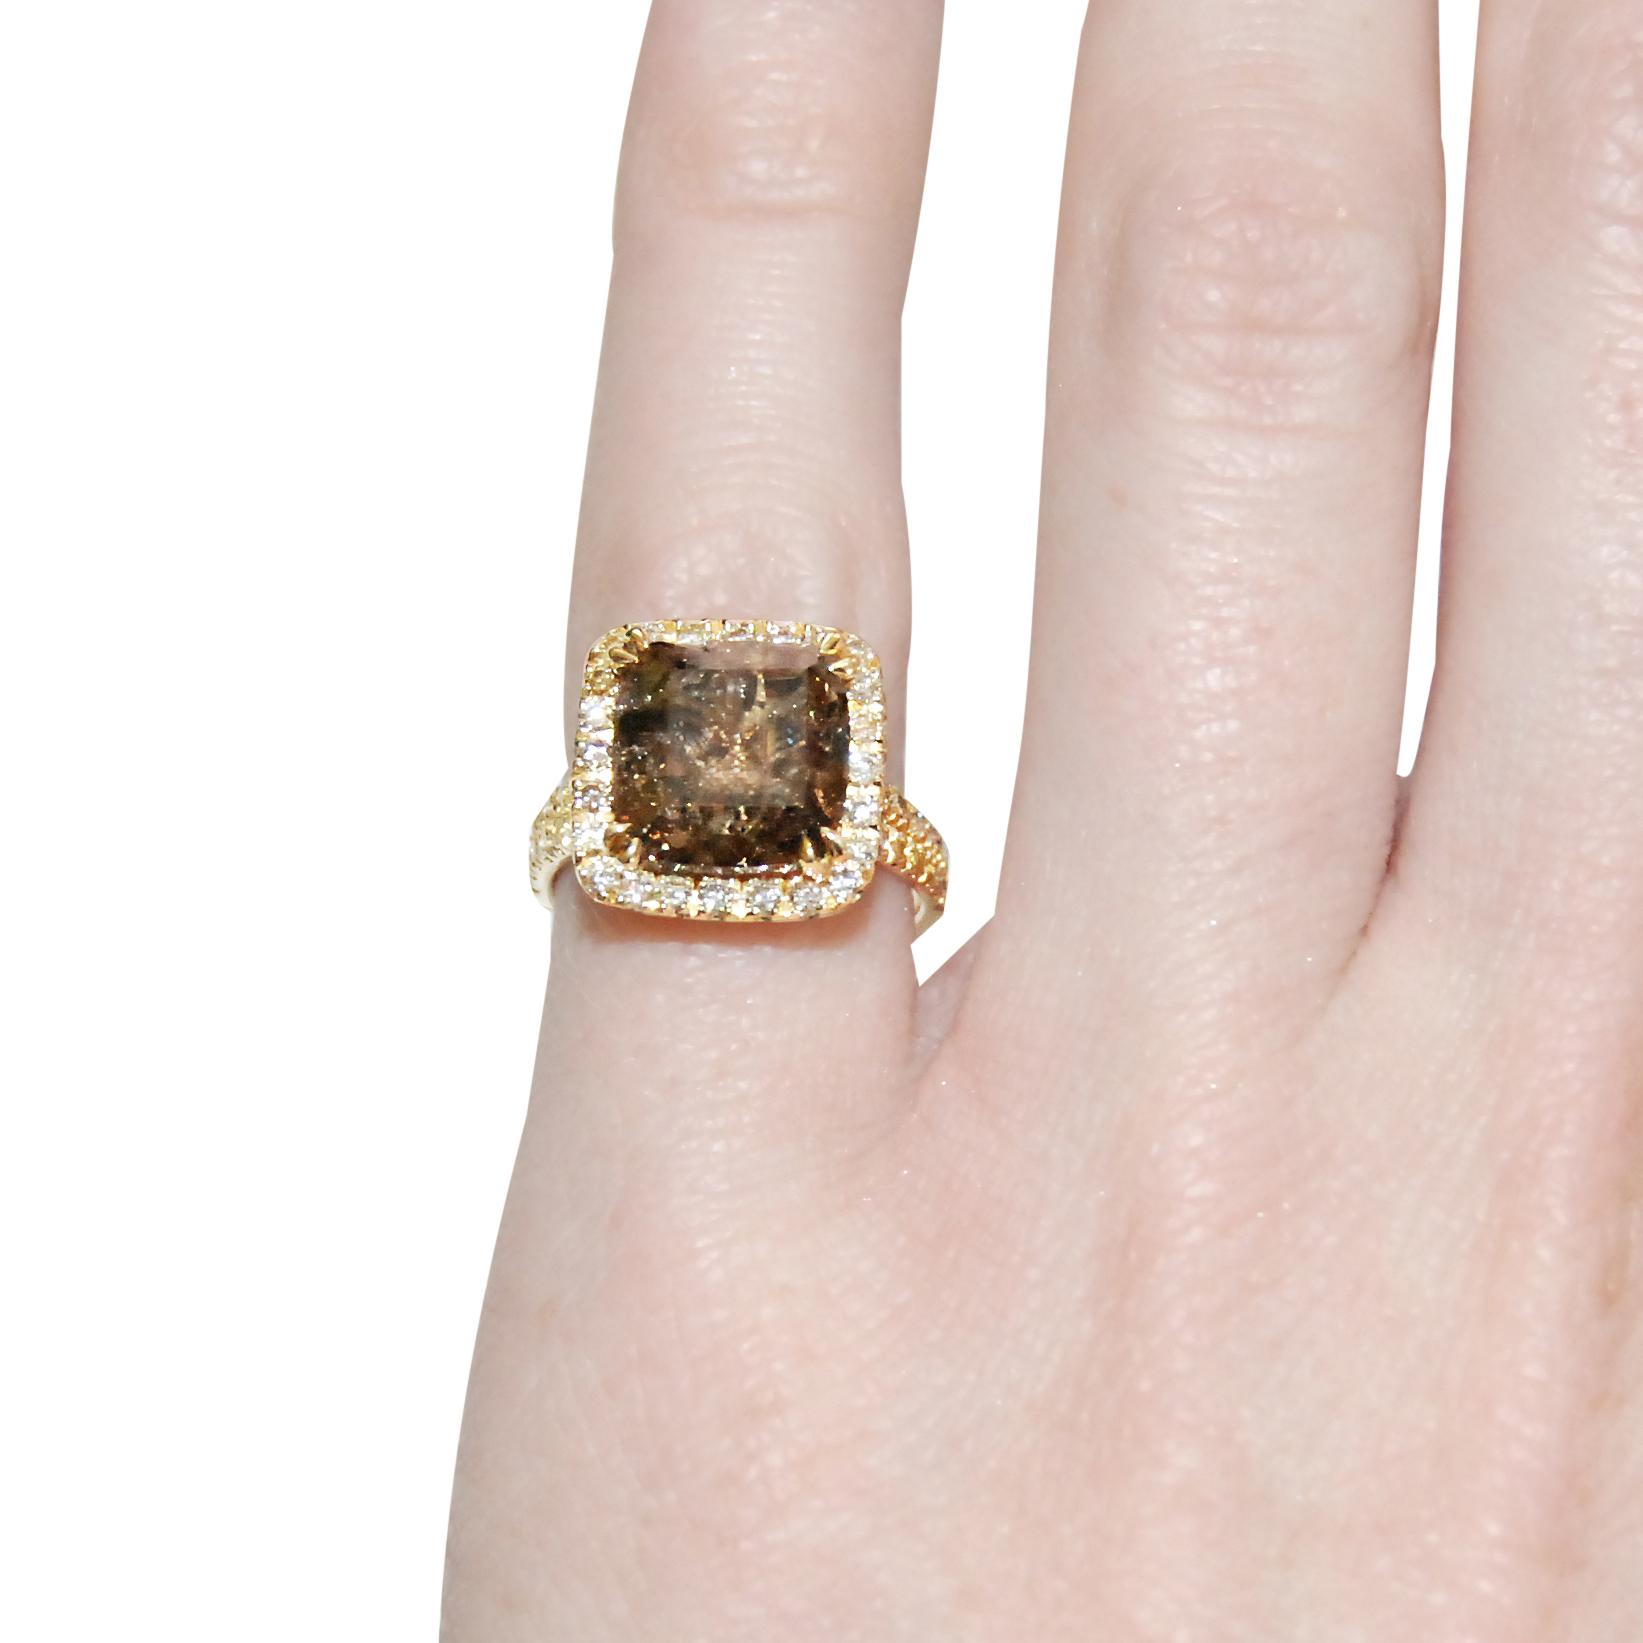 Cushion-shaped-diamond-cut-down-cluster-ring-finger shot.jpg